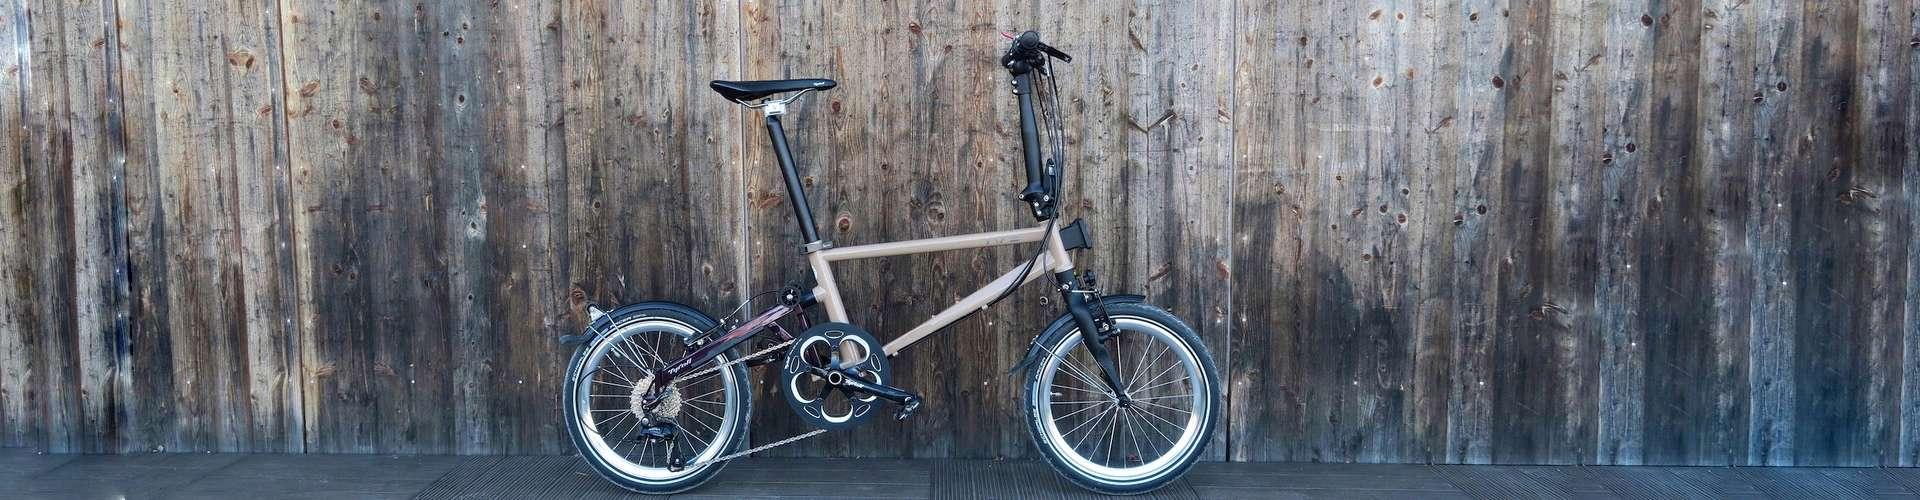 Boxbike Faltrad Online Shop